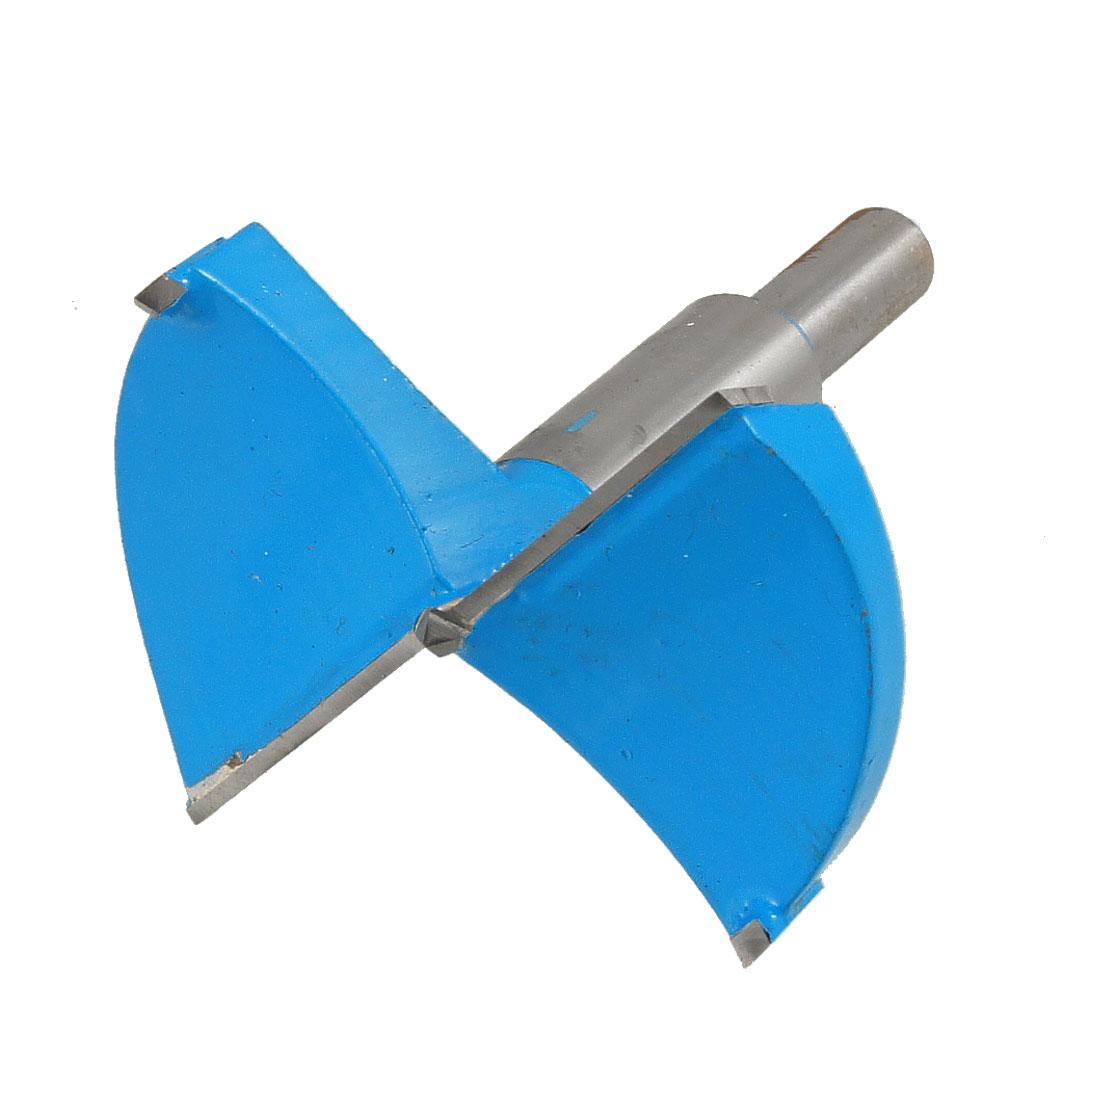 70mm Cutting Diameter Hinge Boring Drill Bit Blue Gray